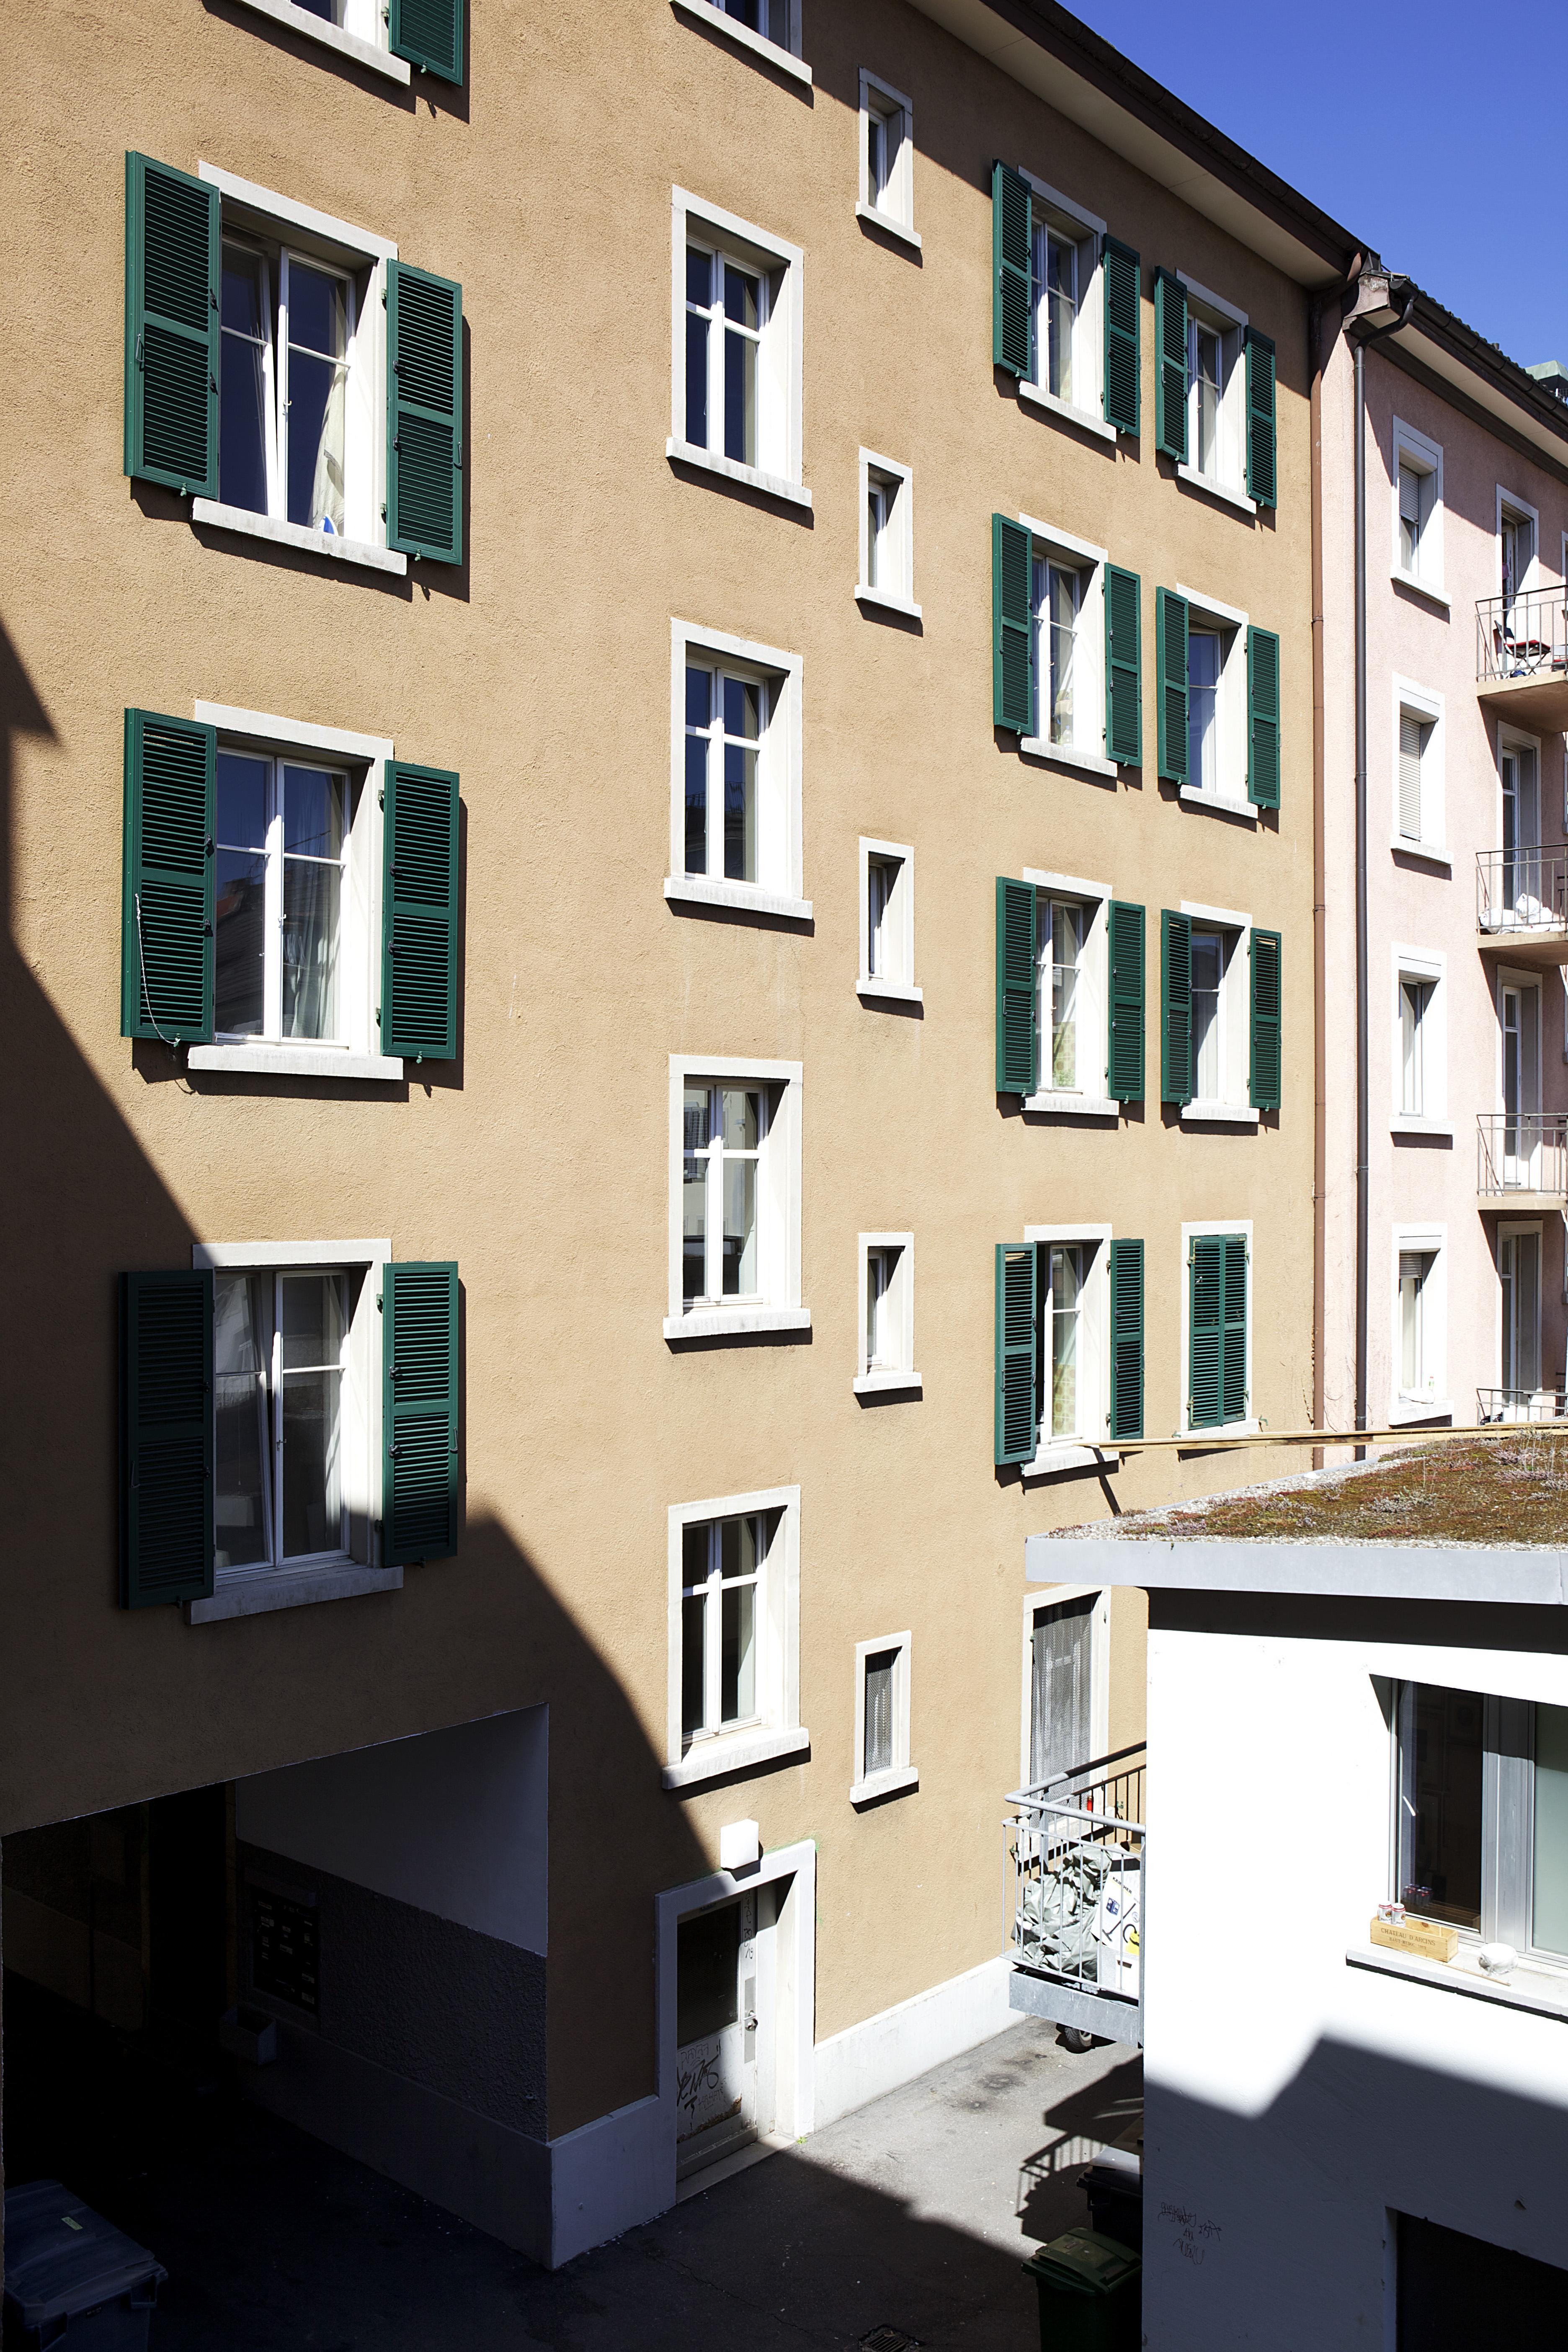 Tellhof_Fassade_Hof 4